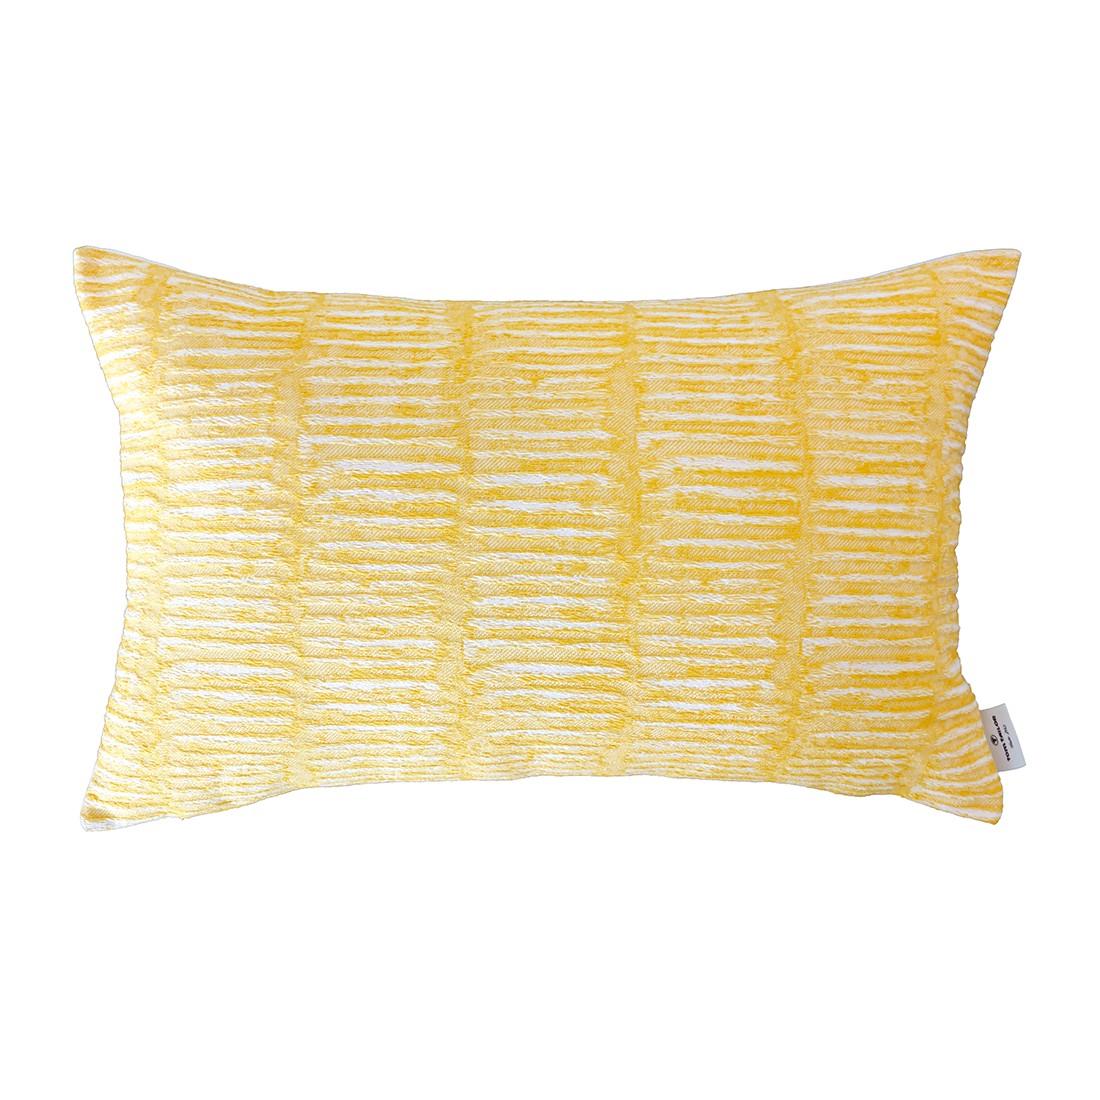 Kissenhülle T-Dashed Weaving – Gelb – Maße: 35 x 55 cm, Tom Tailor günstig bestellen